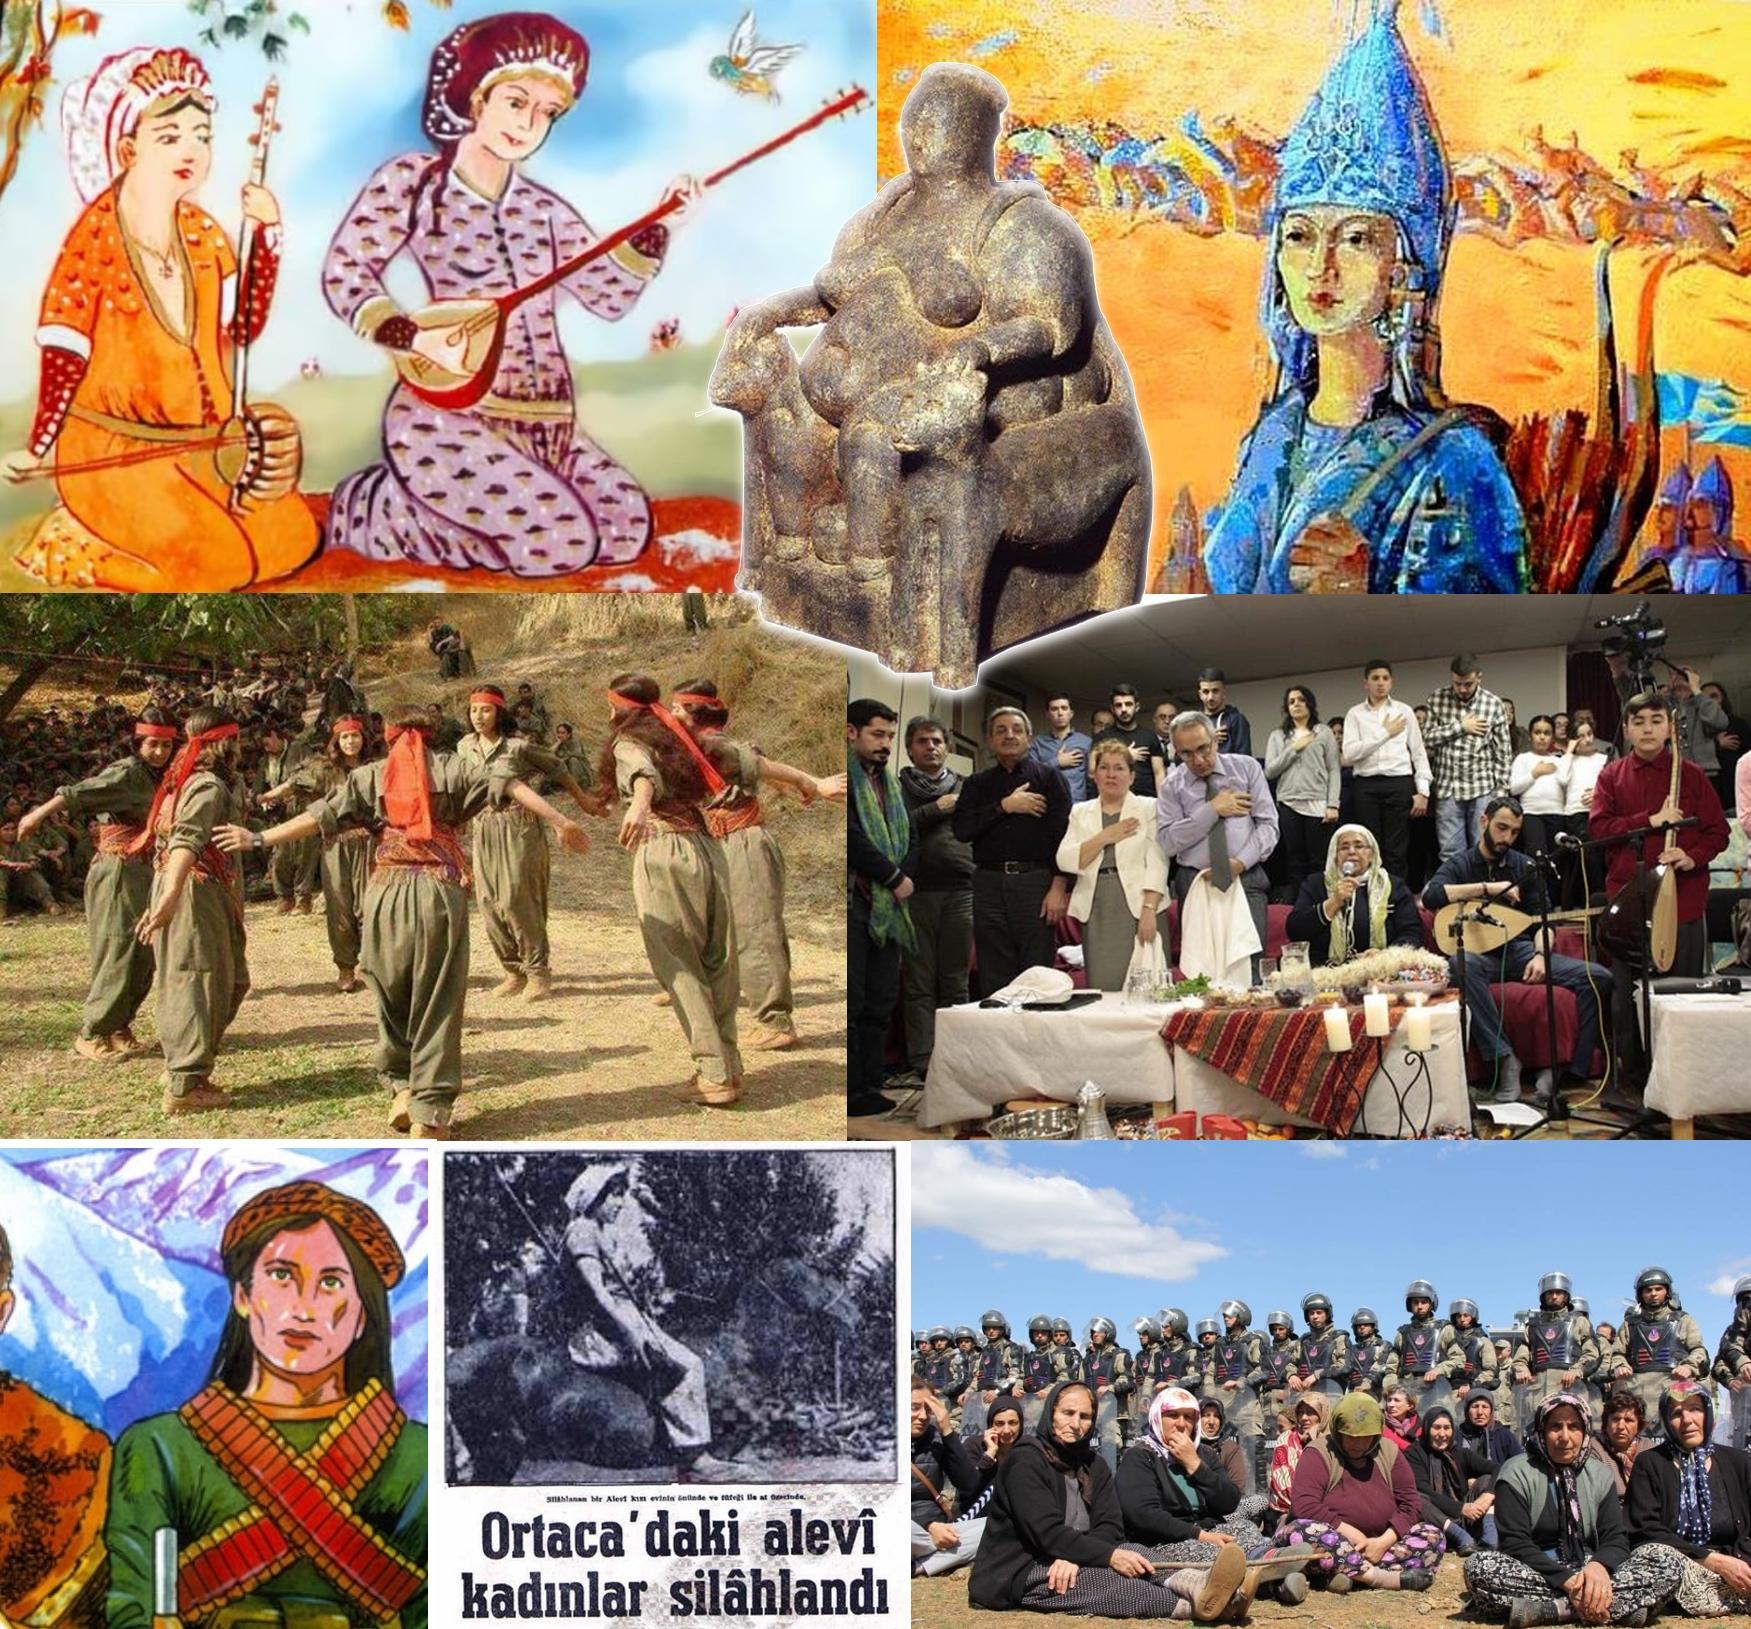 4-Kvinder-kadin-kadıncık-ana-mor-god-DAB-Revolutionære-Alevi-Forbund-1